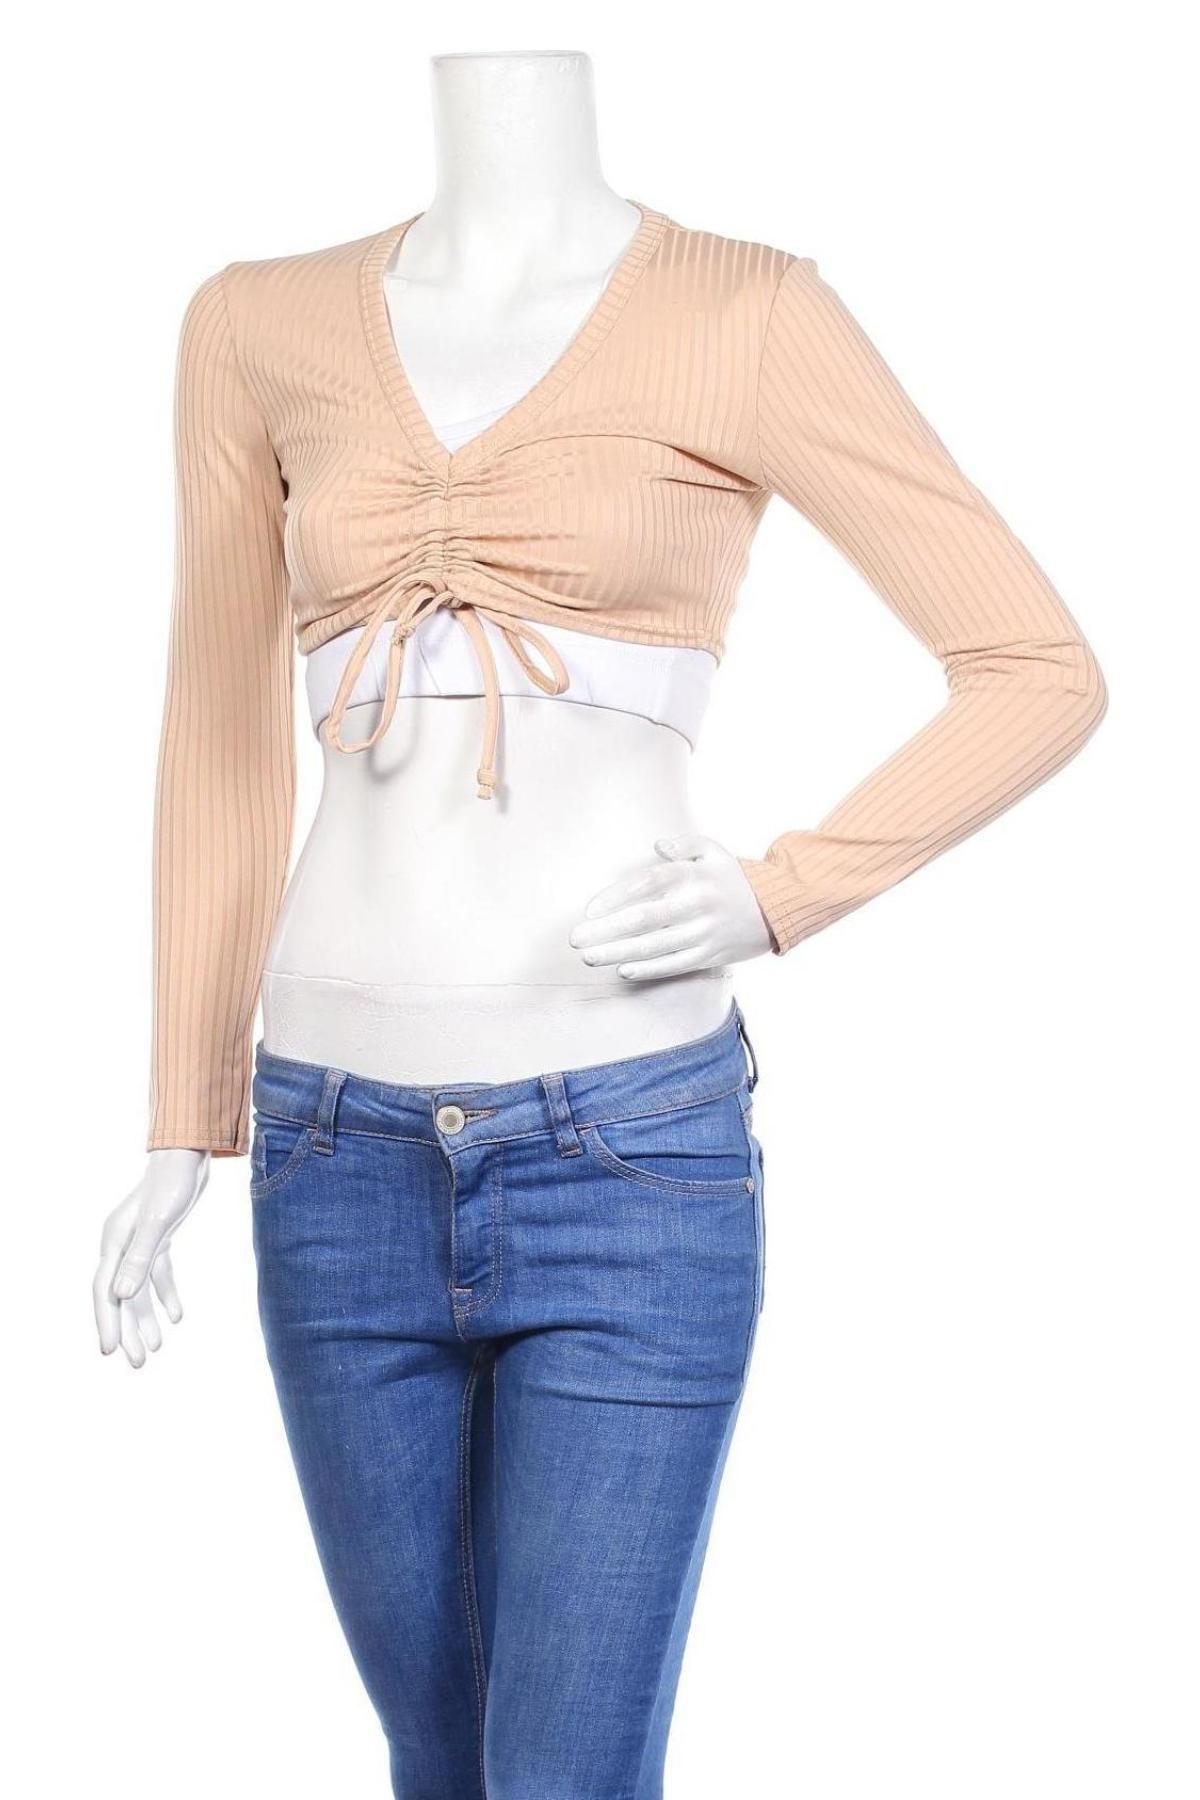 Дамска блуза Stylewise, Размер S, Цвят Сив, 95% полиестер, 5% еластан, Цена 25,50лв.